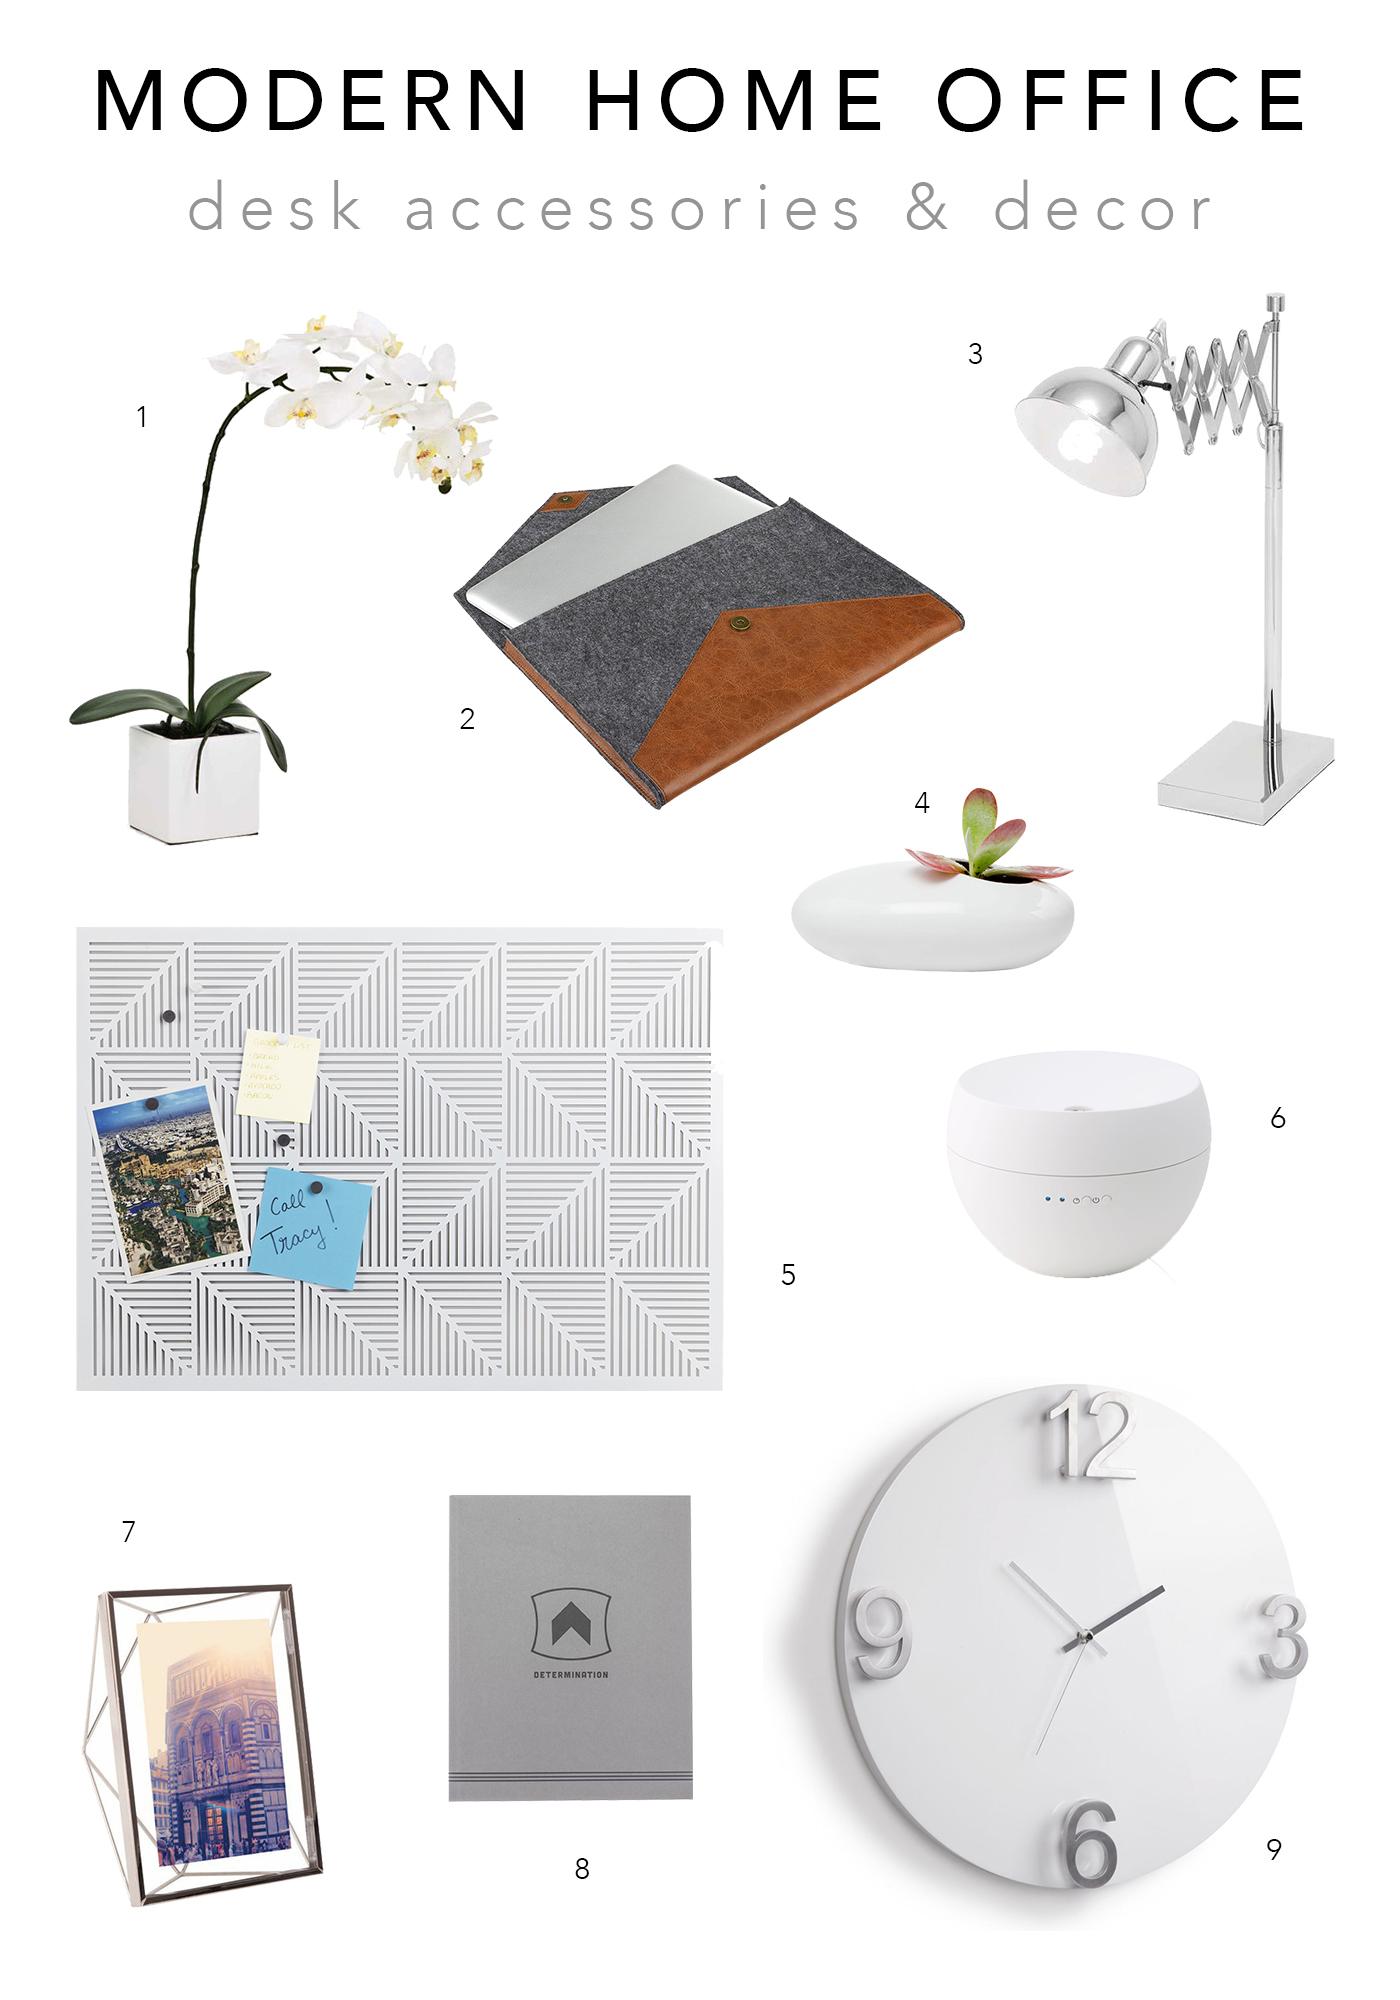 Dot & Bo Modern Home Office - Desk Accessories & Decor